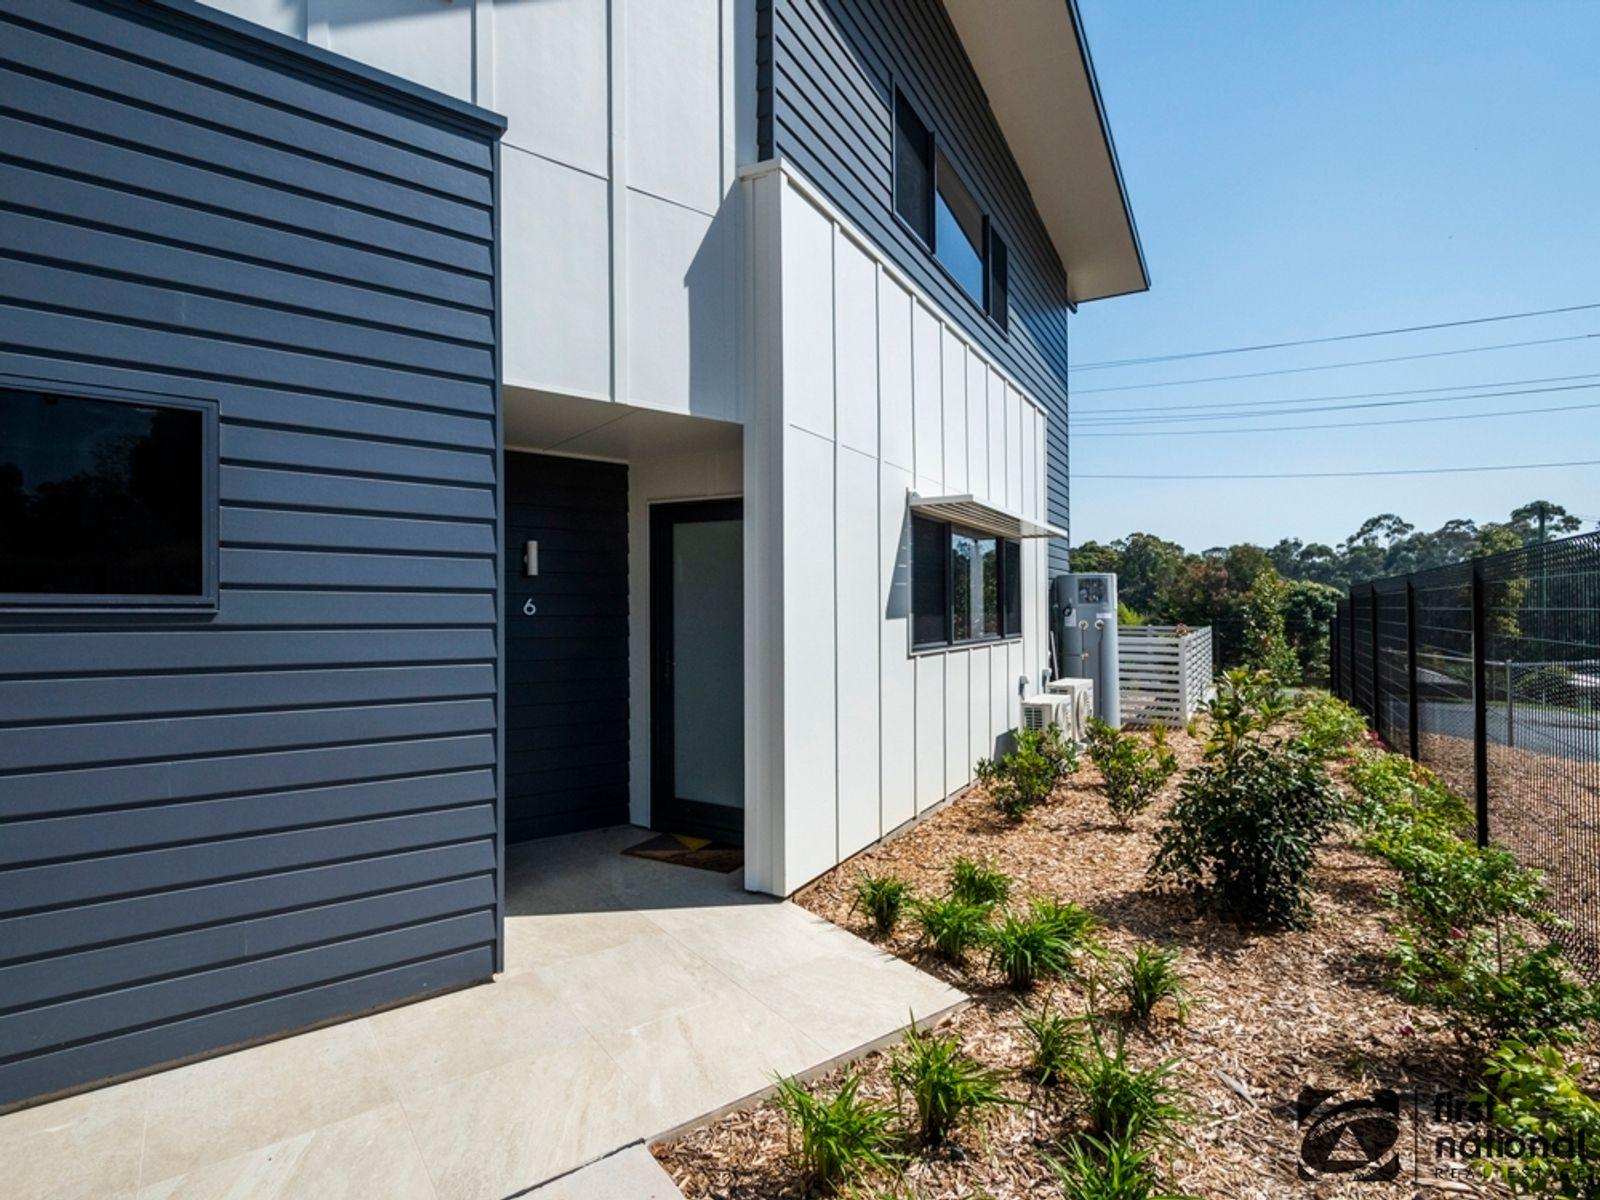 6/12 Dibbs Street, Coffs Harbour, NSW 2450